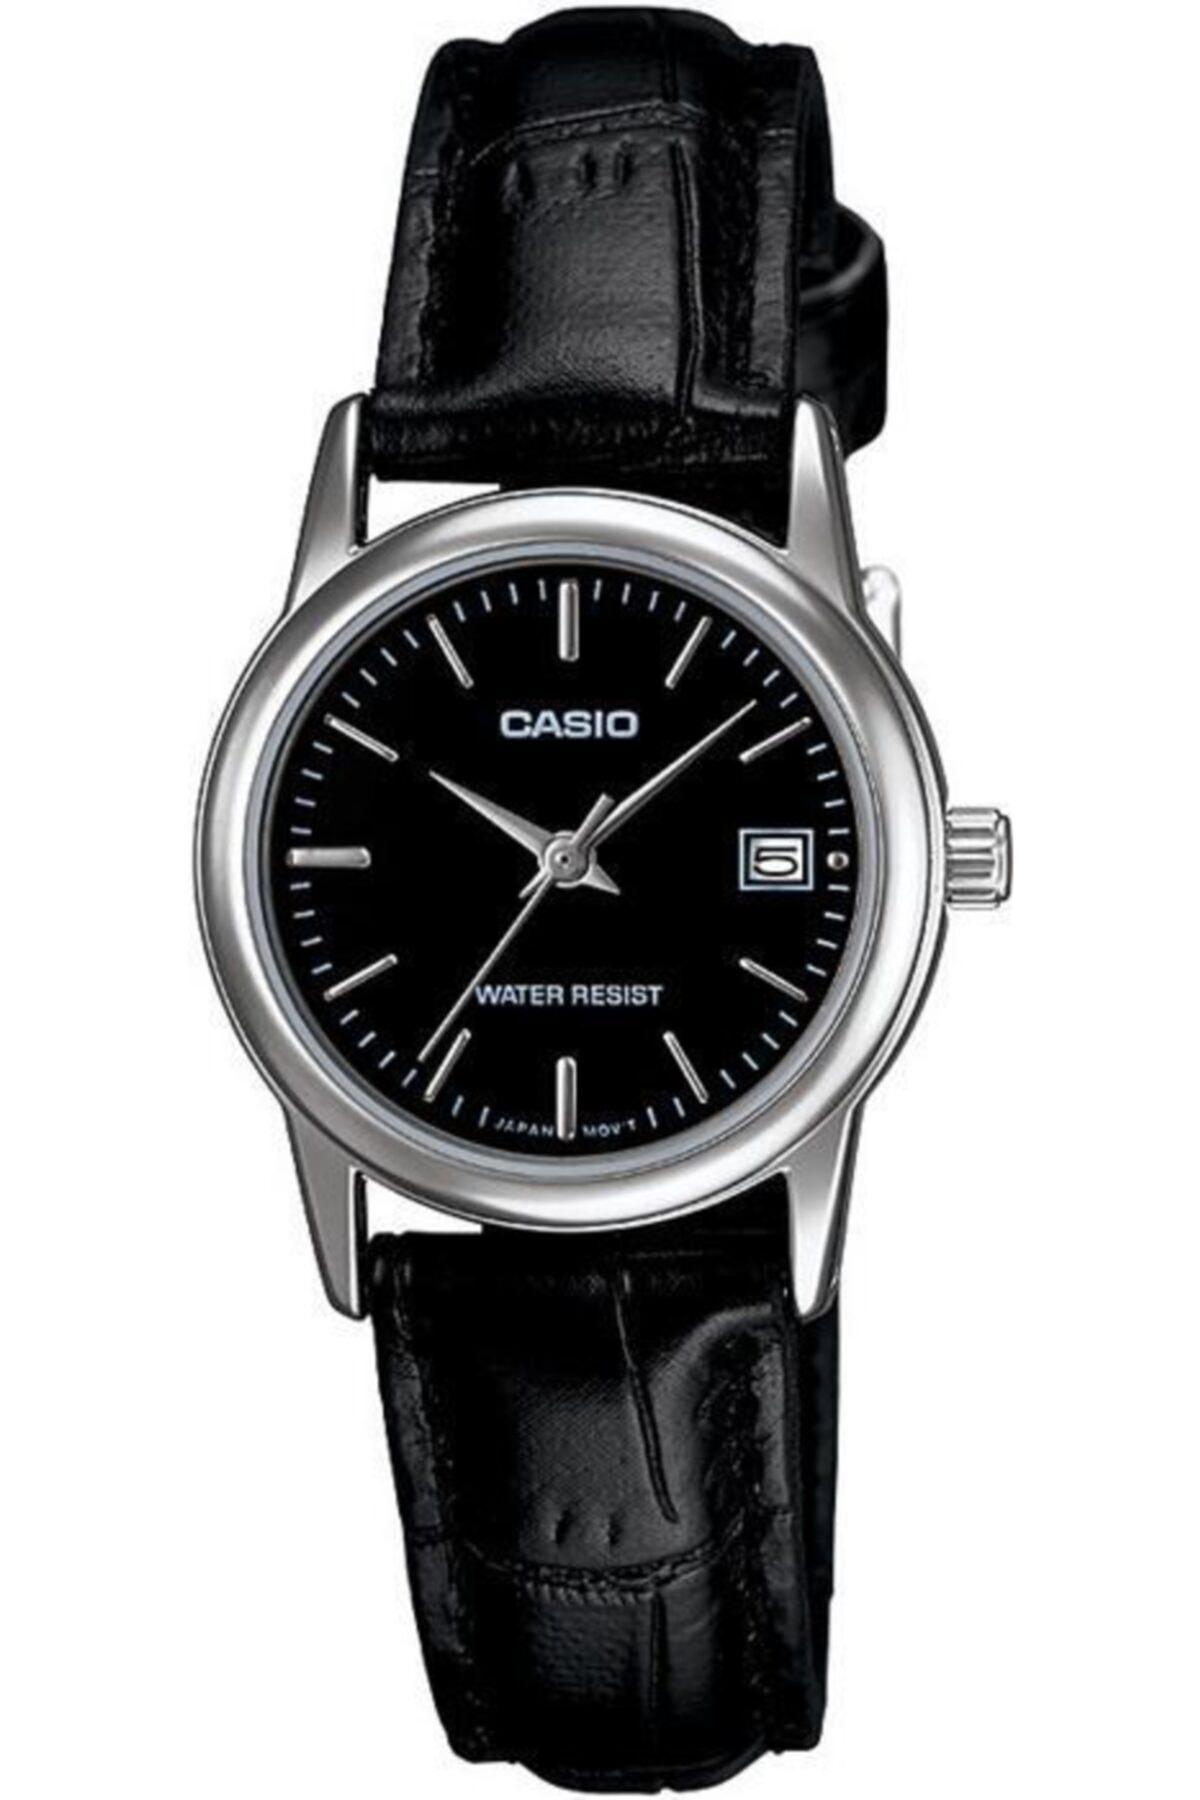 Casio Casıo Ltp-v002l-1audf 2